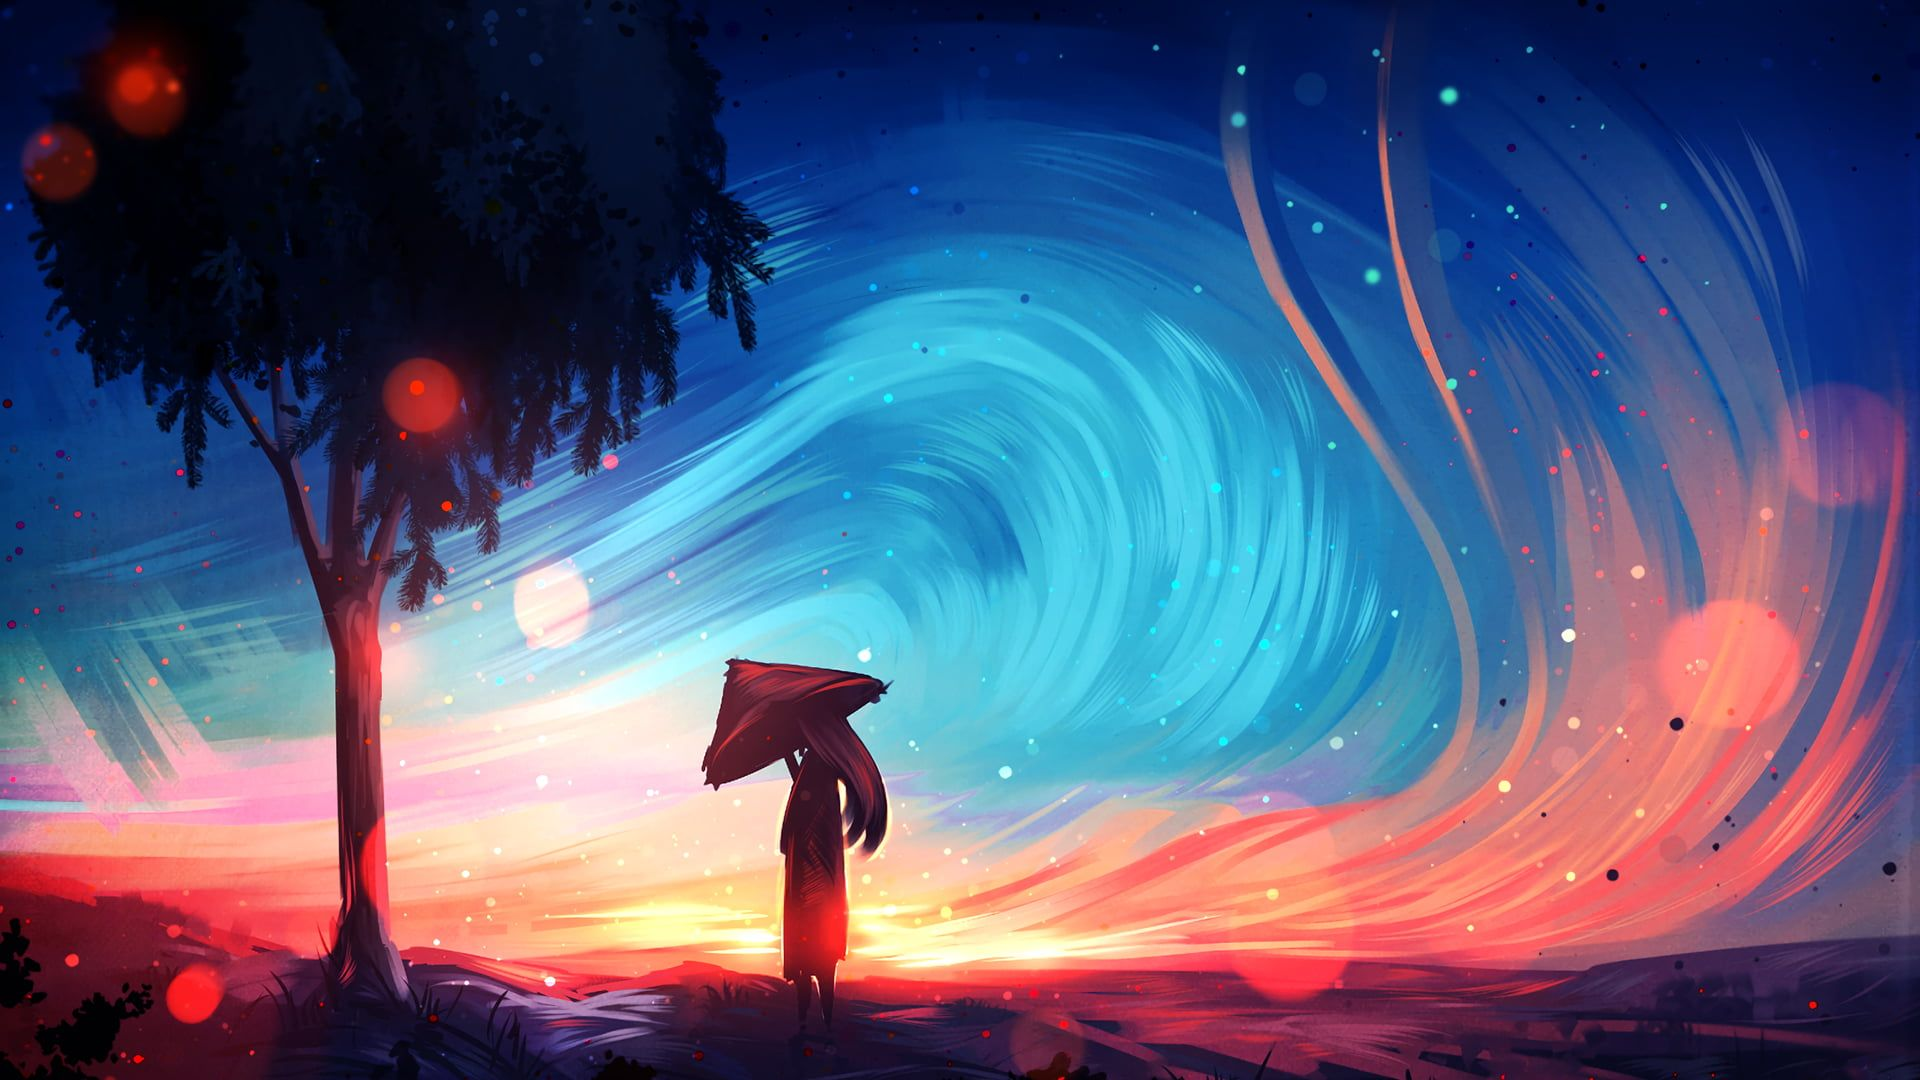 3840x2160 Digital Art 4k Wallpaper High Resolution Scenery Wallpaper Anime Scenery Wallpaper Landscape Illustration